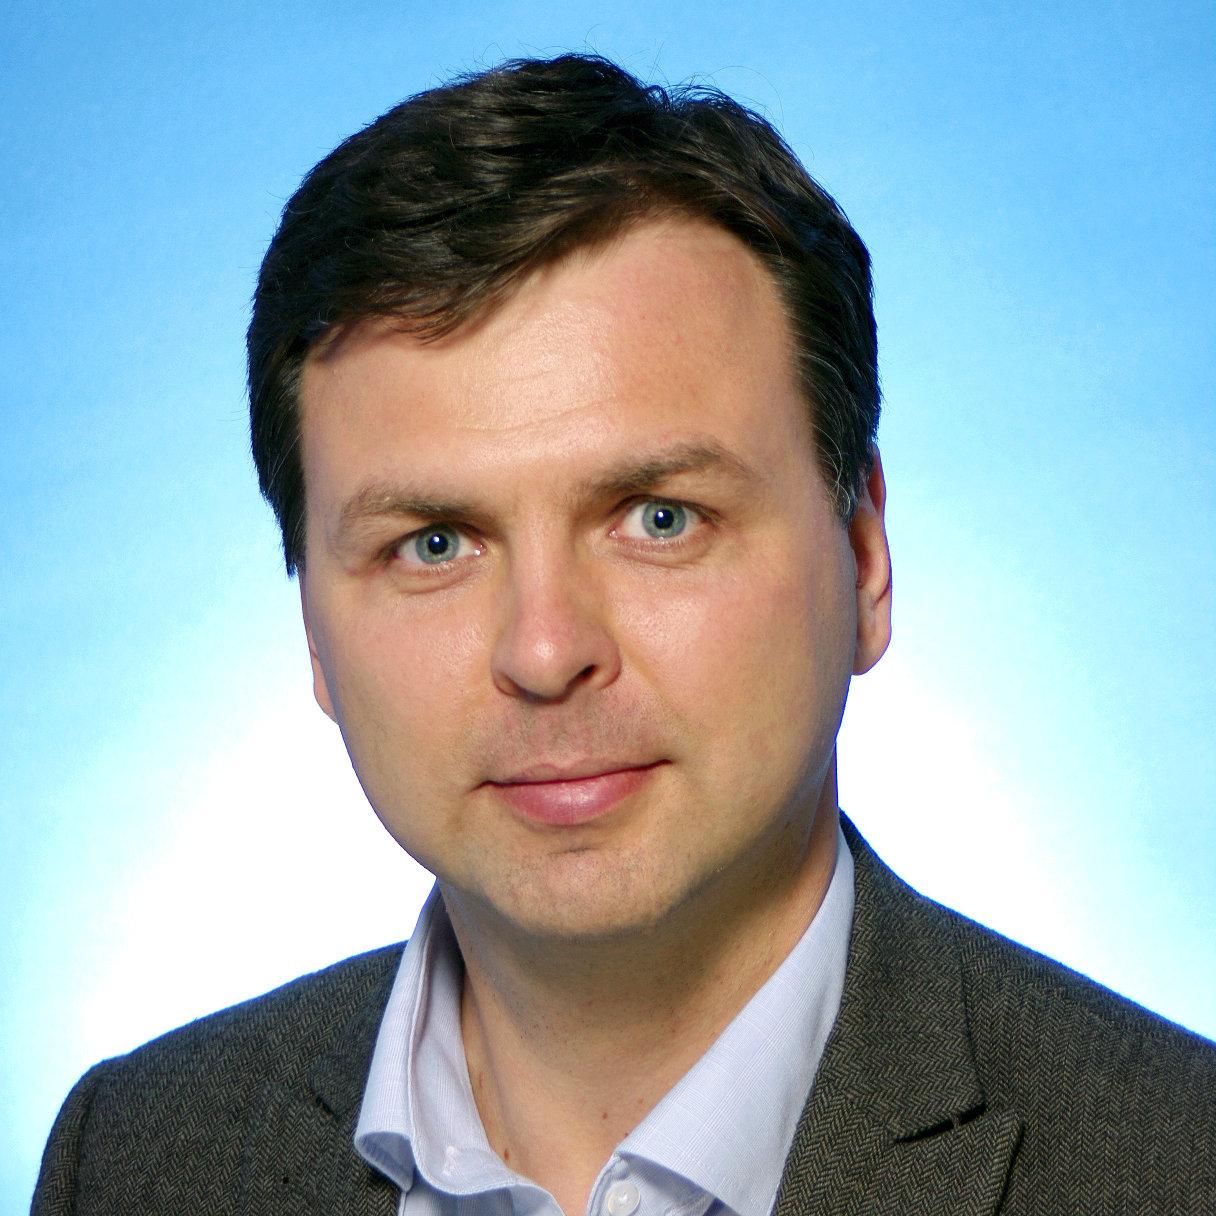 Kristjan Rotenberg